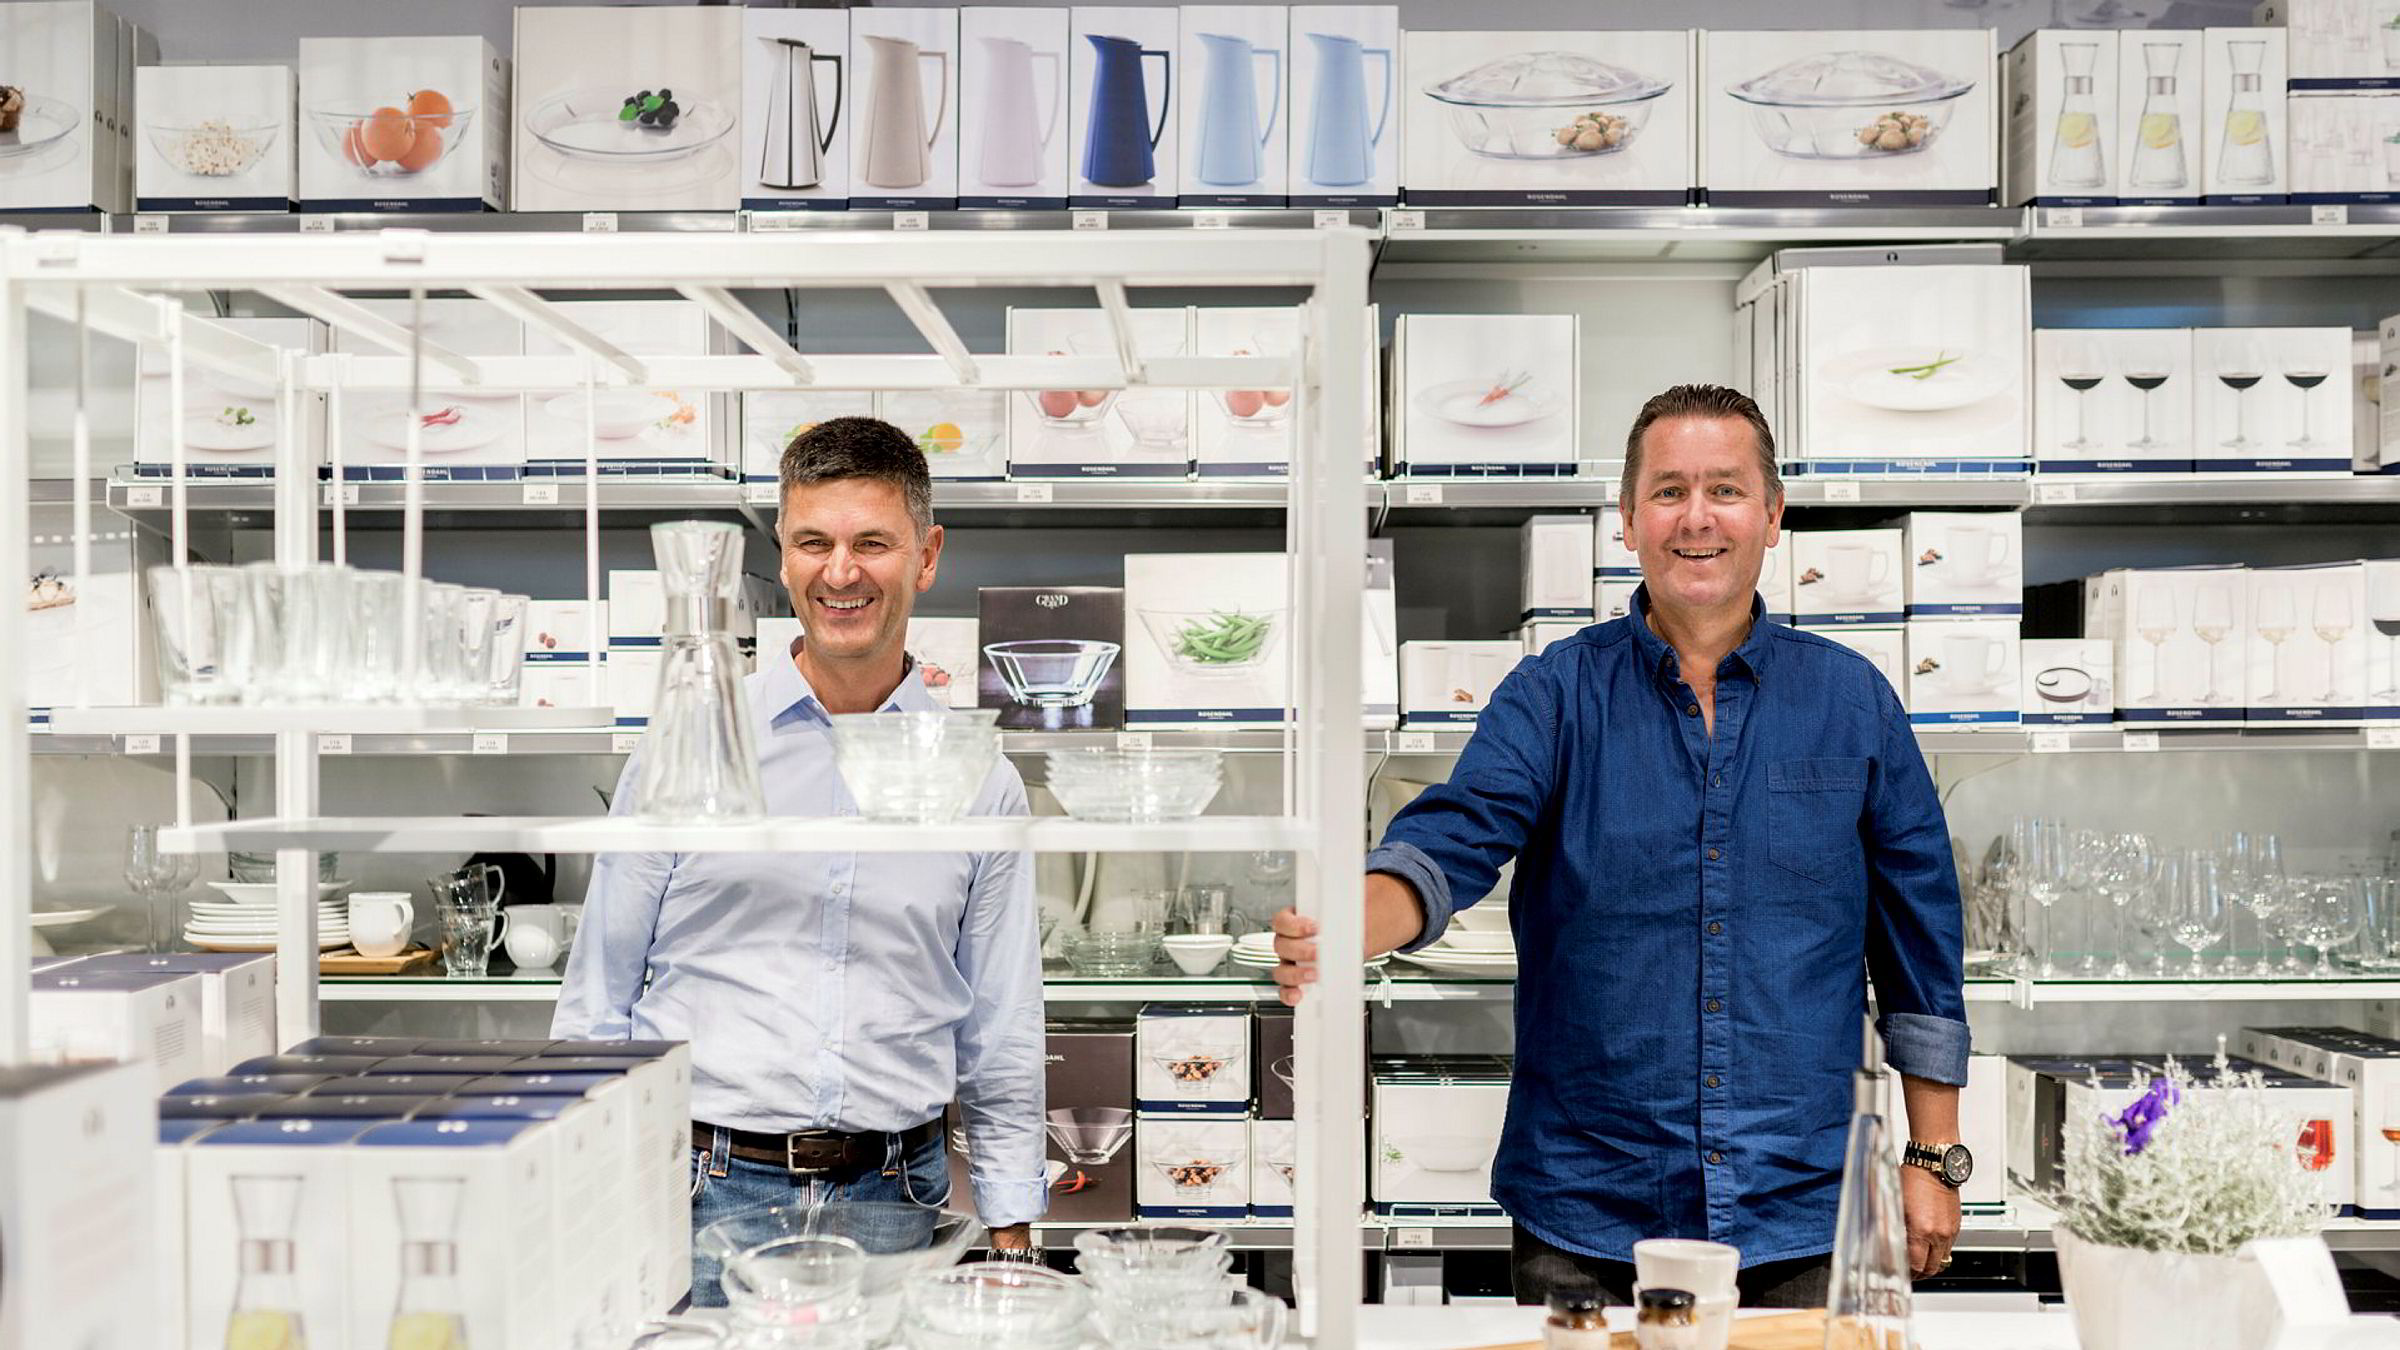 – Vi har vært med i en budrunde og kjøpt dette til markedspris ved at vi hadde det høyeste budet, sier daglig leder i Kitch'n, Odd Sverre Arnøy (til venstre) her sammen med Kitch'n-gründer Wiggo Erichsen.